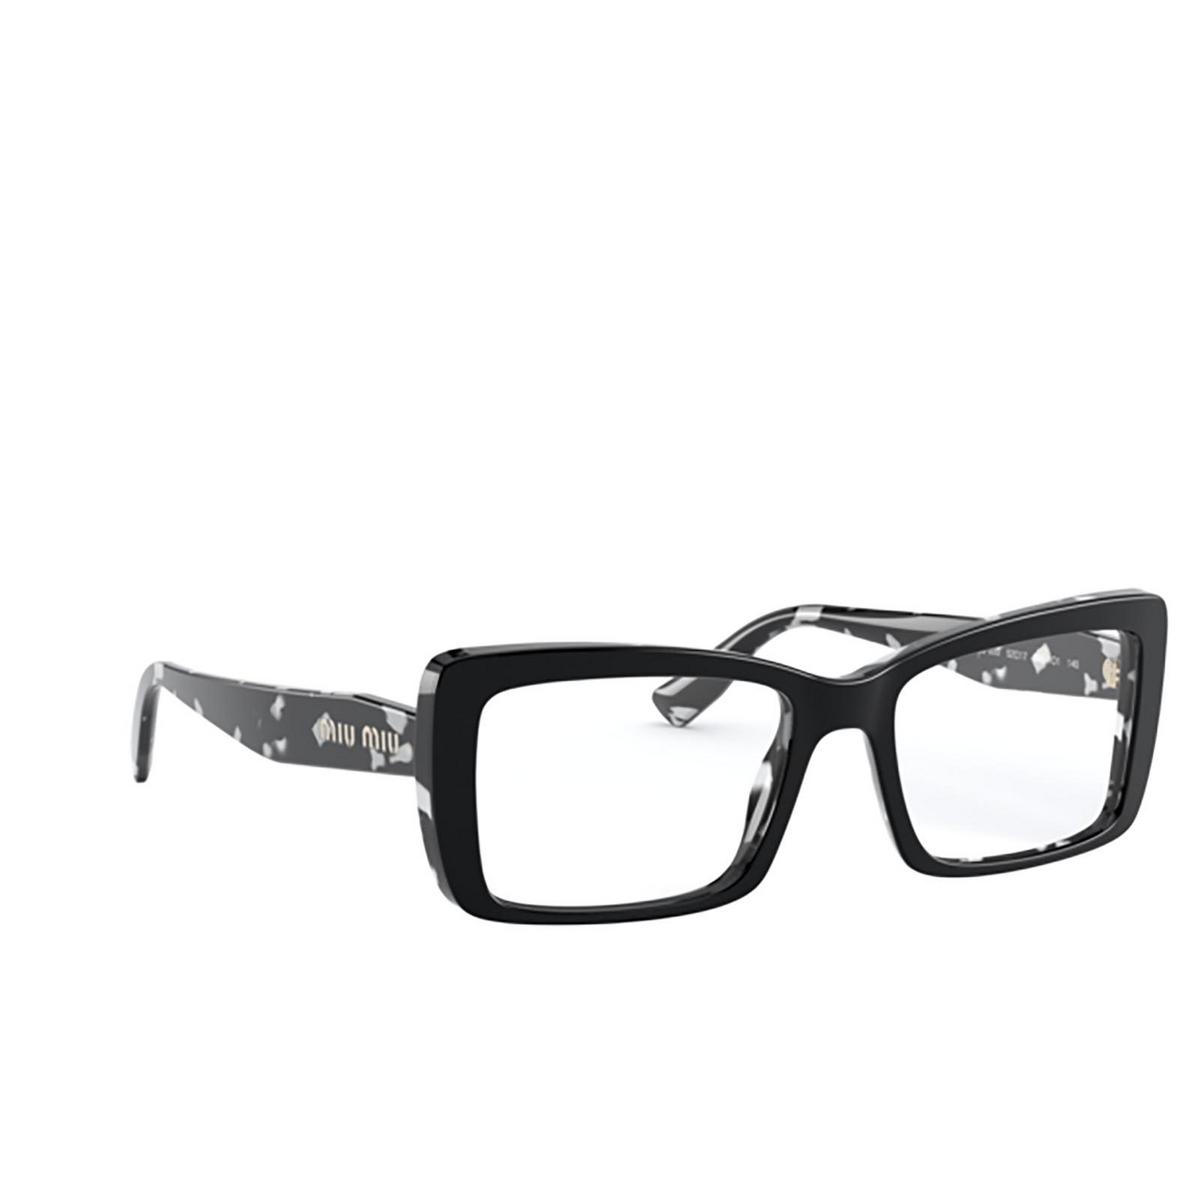 Miu Miu® Rectangle Eyeglasses: MU 03SV color Havana Black White Top Black 06E1O1 - three-quarters view.